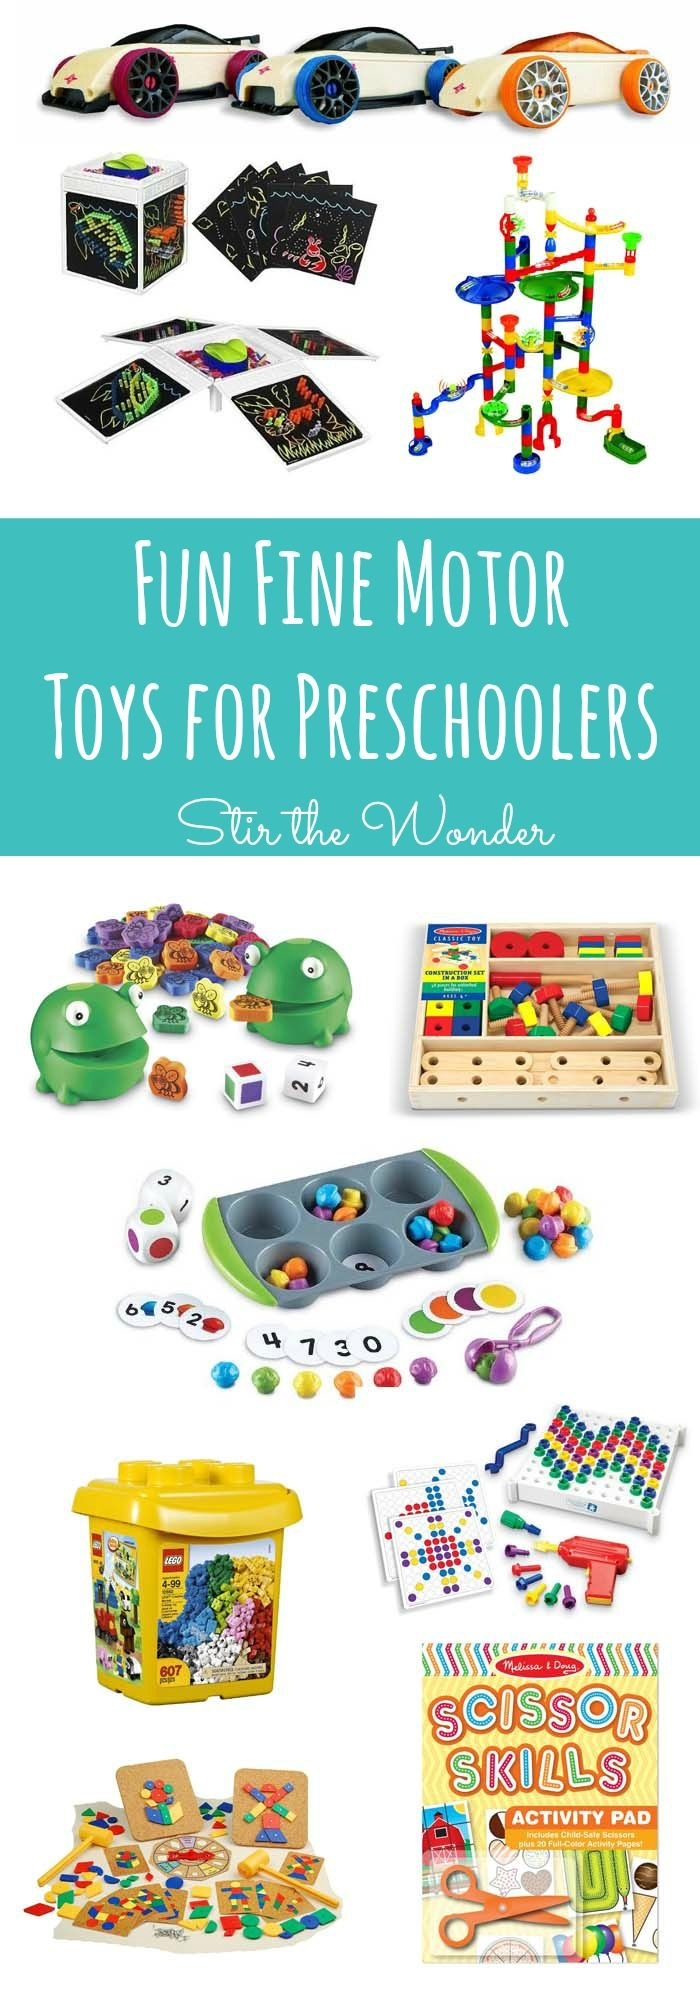 Fun Fine Motor Toys for Preschoolers | Stir the Wonder